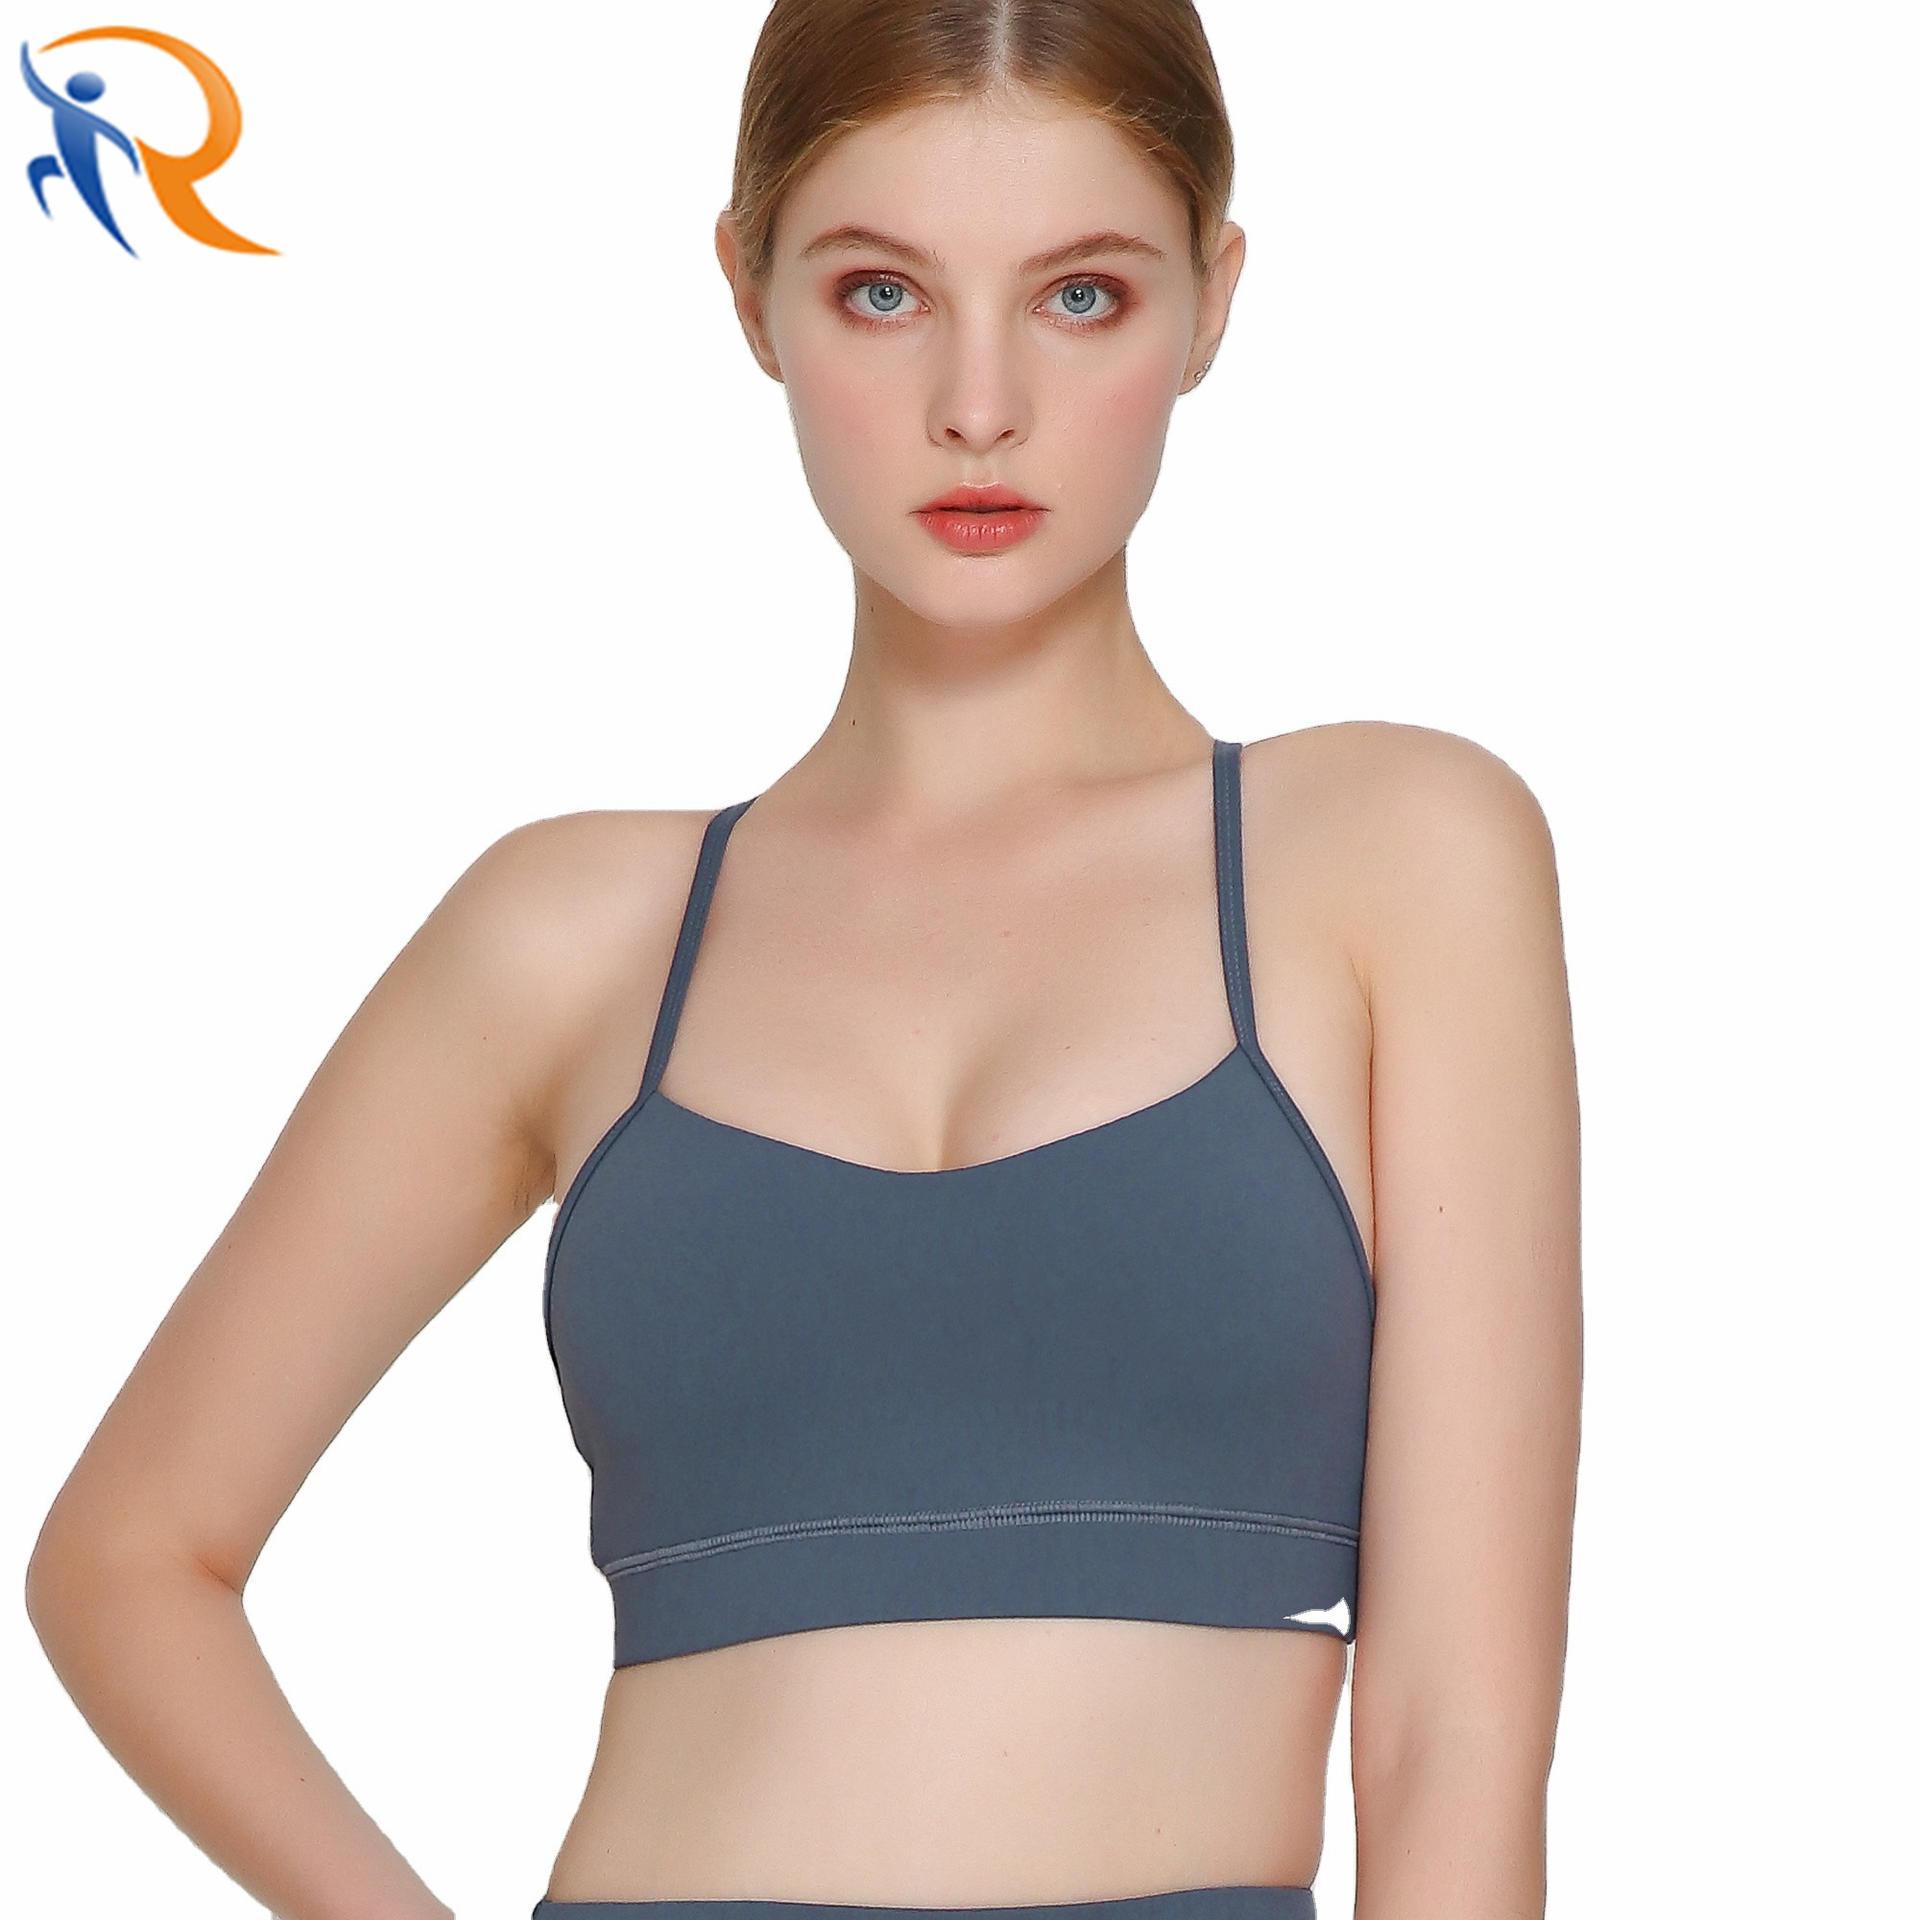 High Quality Workout Sportswear Yoga Bra Top Activewear for Women